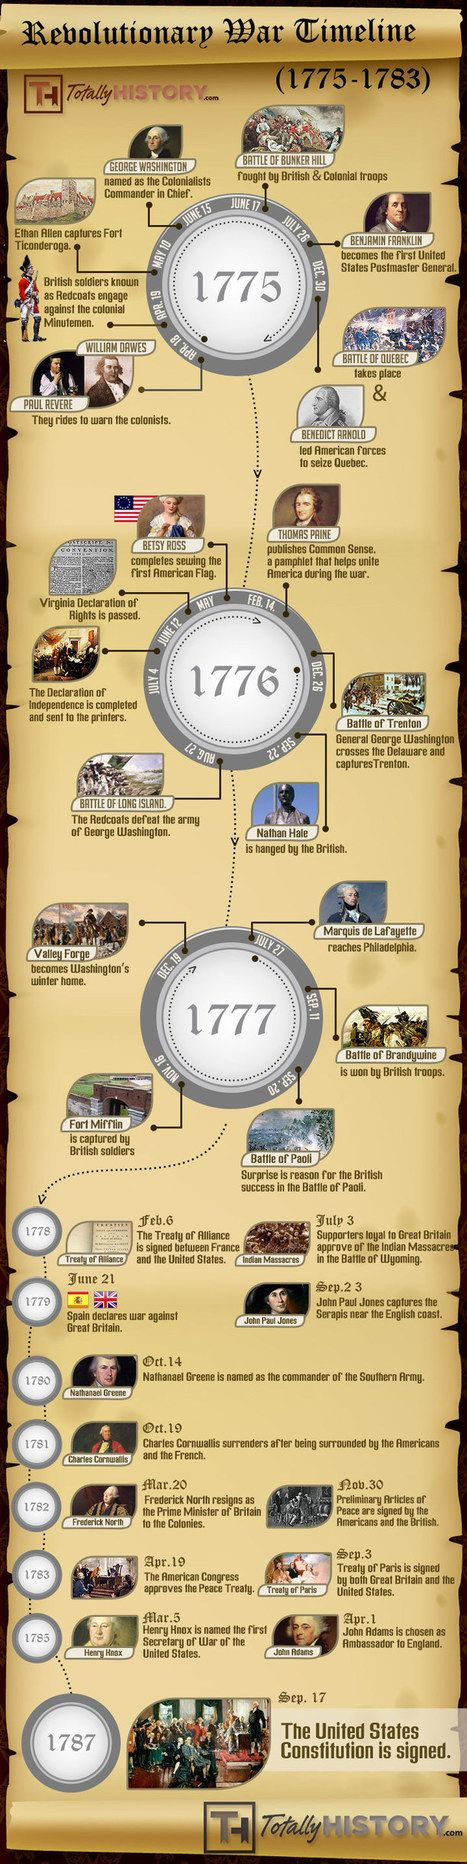 US Revolutionary War Timeline | Storia Moderna | Scoop.it